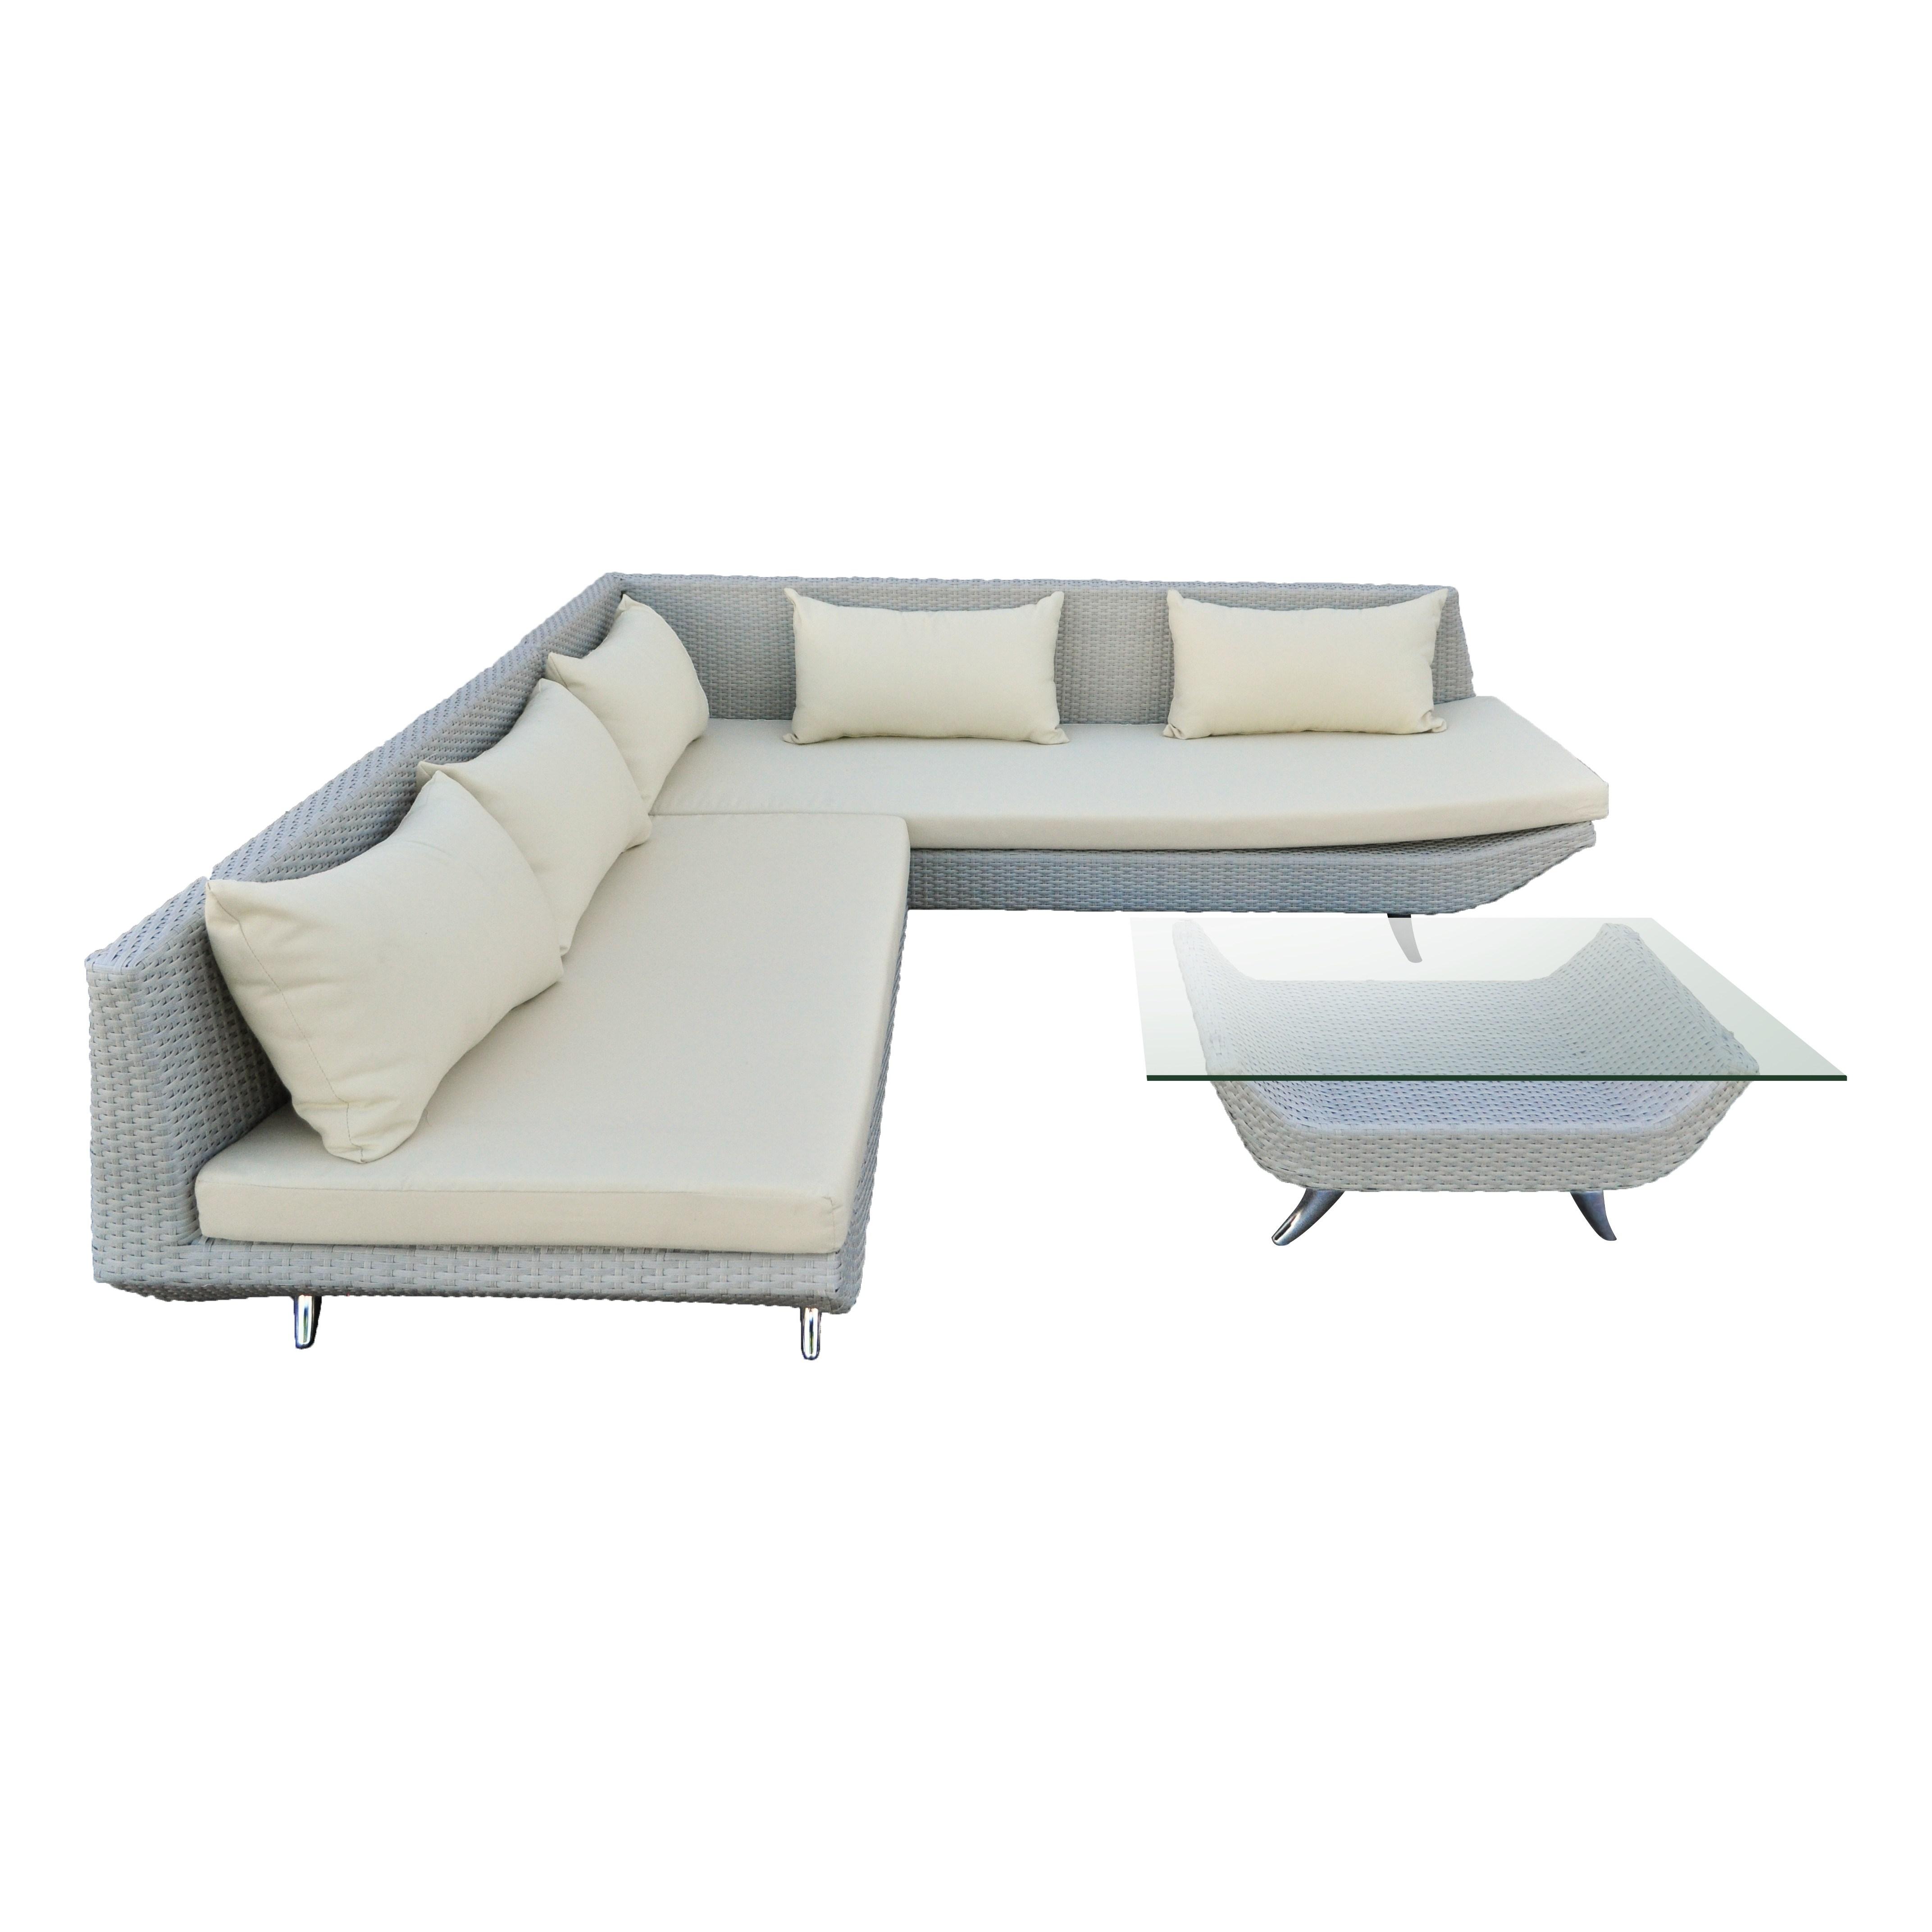 Furniture & Sofa: Ebel Patio Furniture (View 7 of 15)